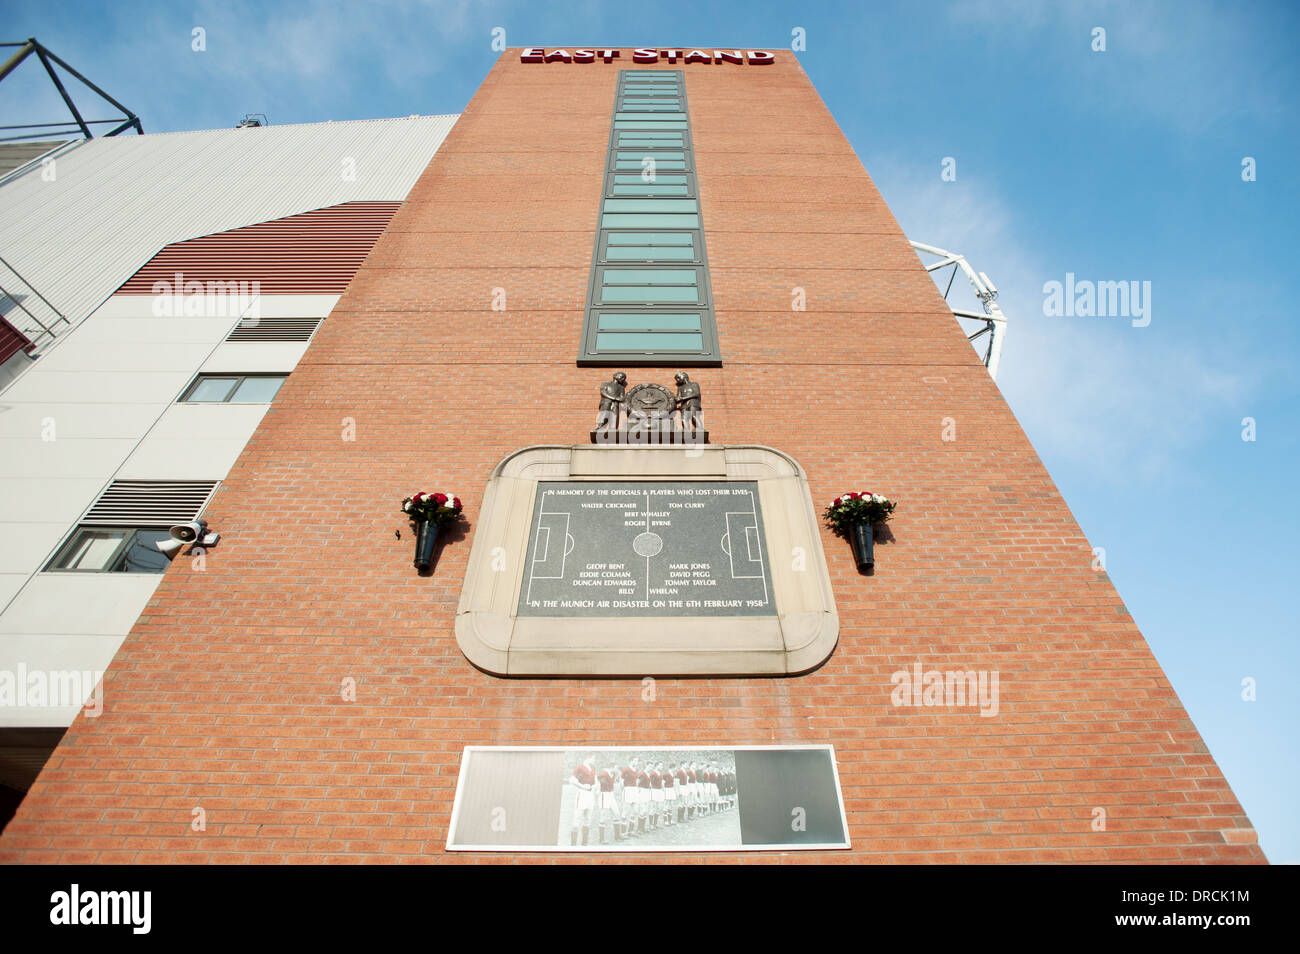 Munich Air Disaster Memorial Plaque - Stock Image